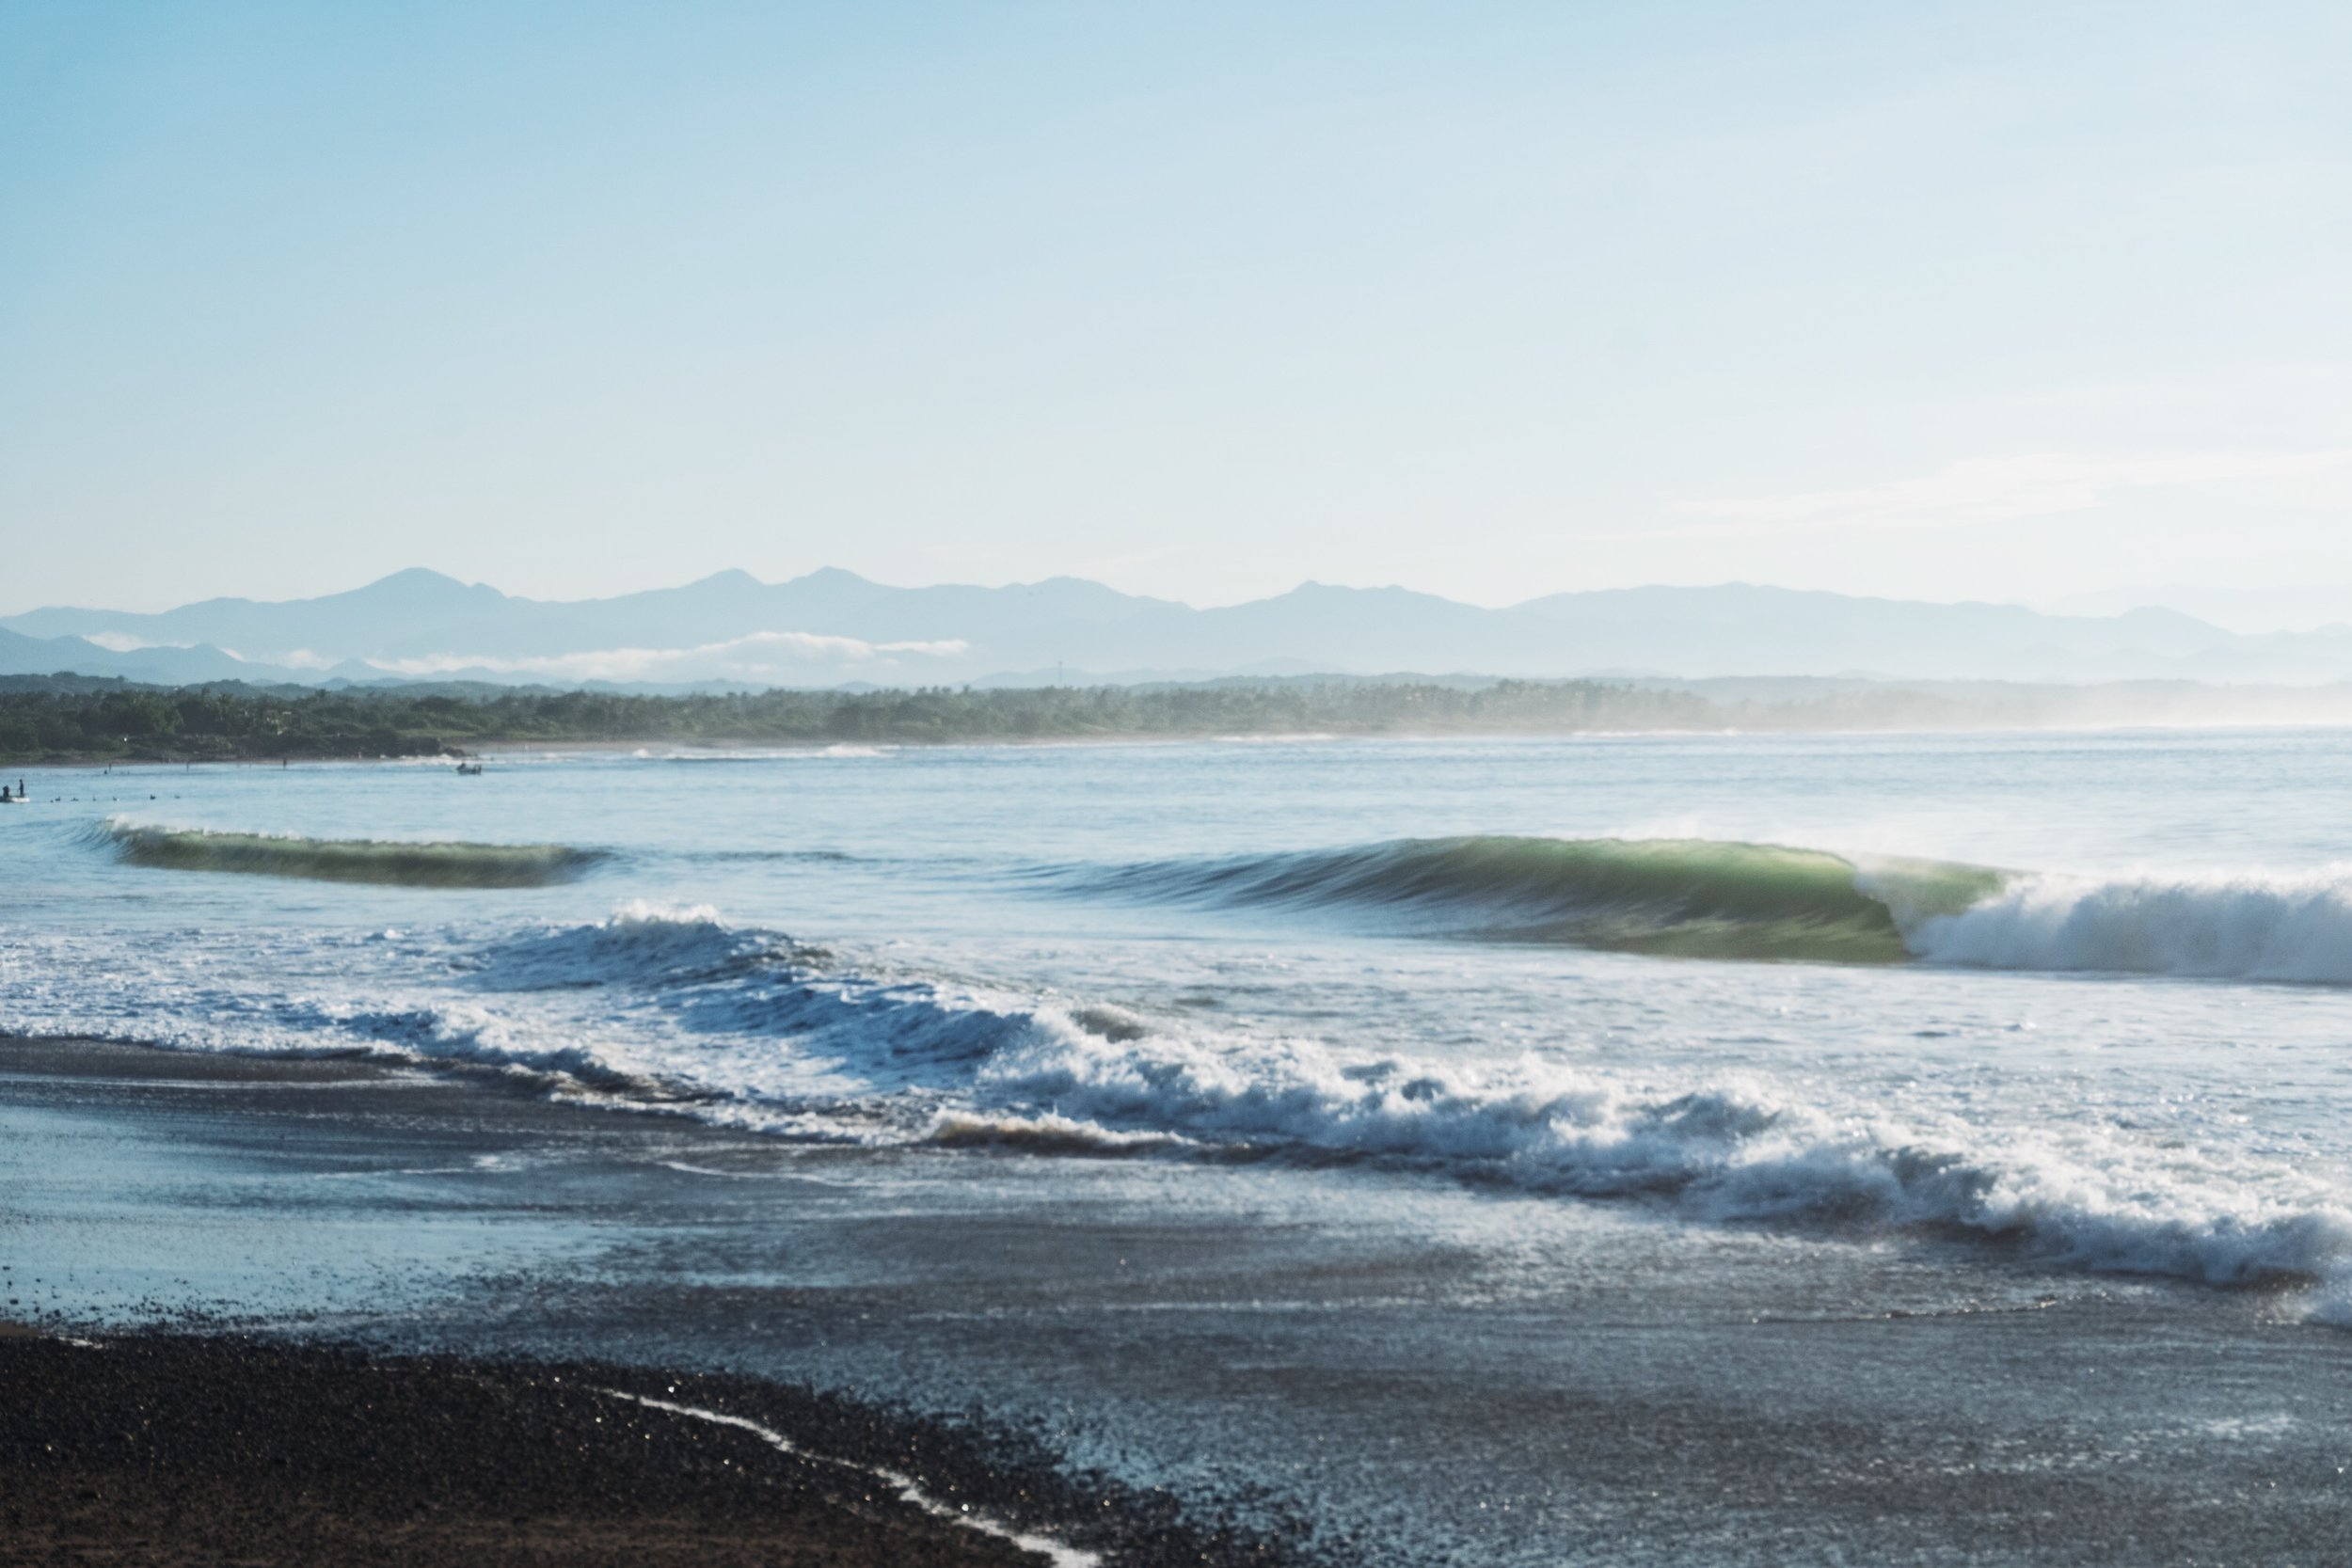 Tristan-Guibald-Surf-México-Sayulita-Pascuales-Zihuatanejo-Fotografía-Heiko-Bothe-5.JPG